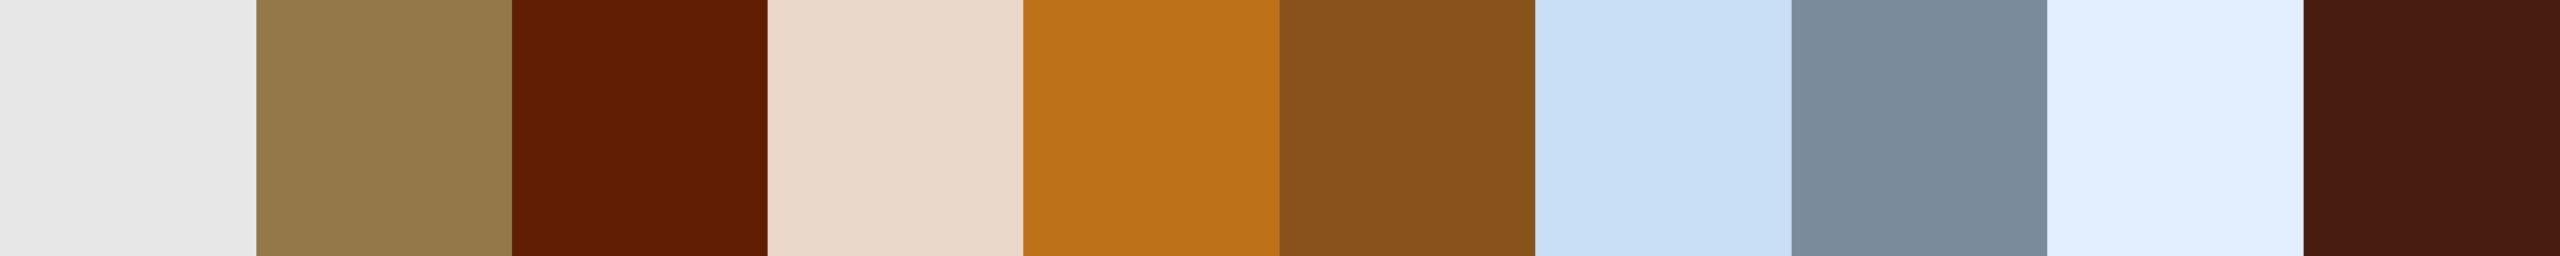 697 Tiopela Color Palette